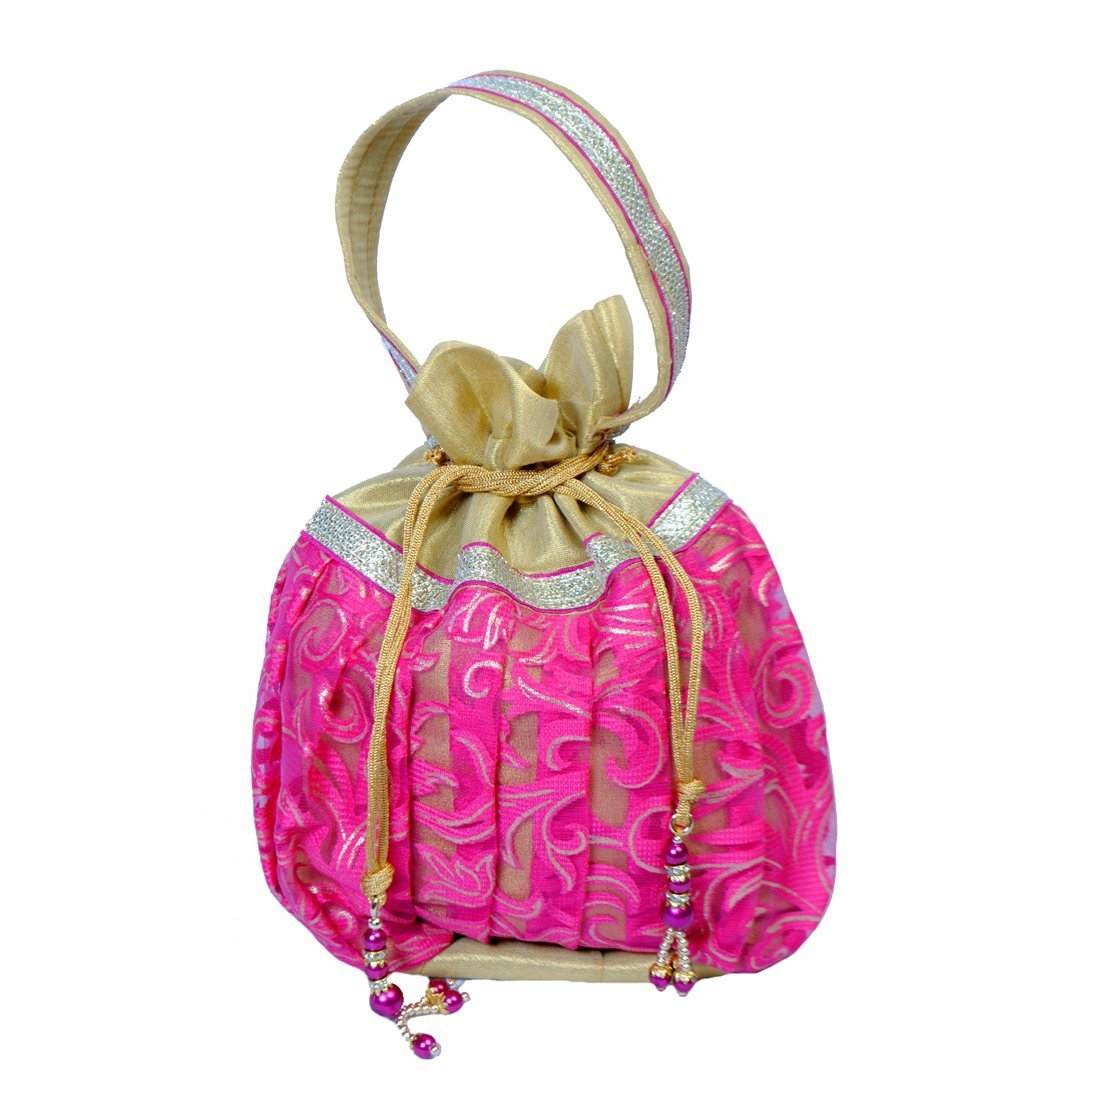 Maitri Creations Women Traditional Silk Brocade Purse Potli Bag Drawstring Jewelry Pouch Bag Cotton Gift Bag Value Set Wristlet Beaded Handbag Wedding Evening Party Designer Bridal Clutch Pink